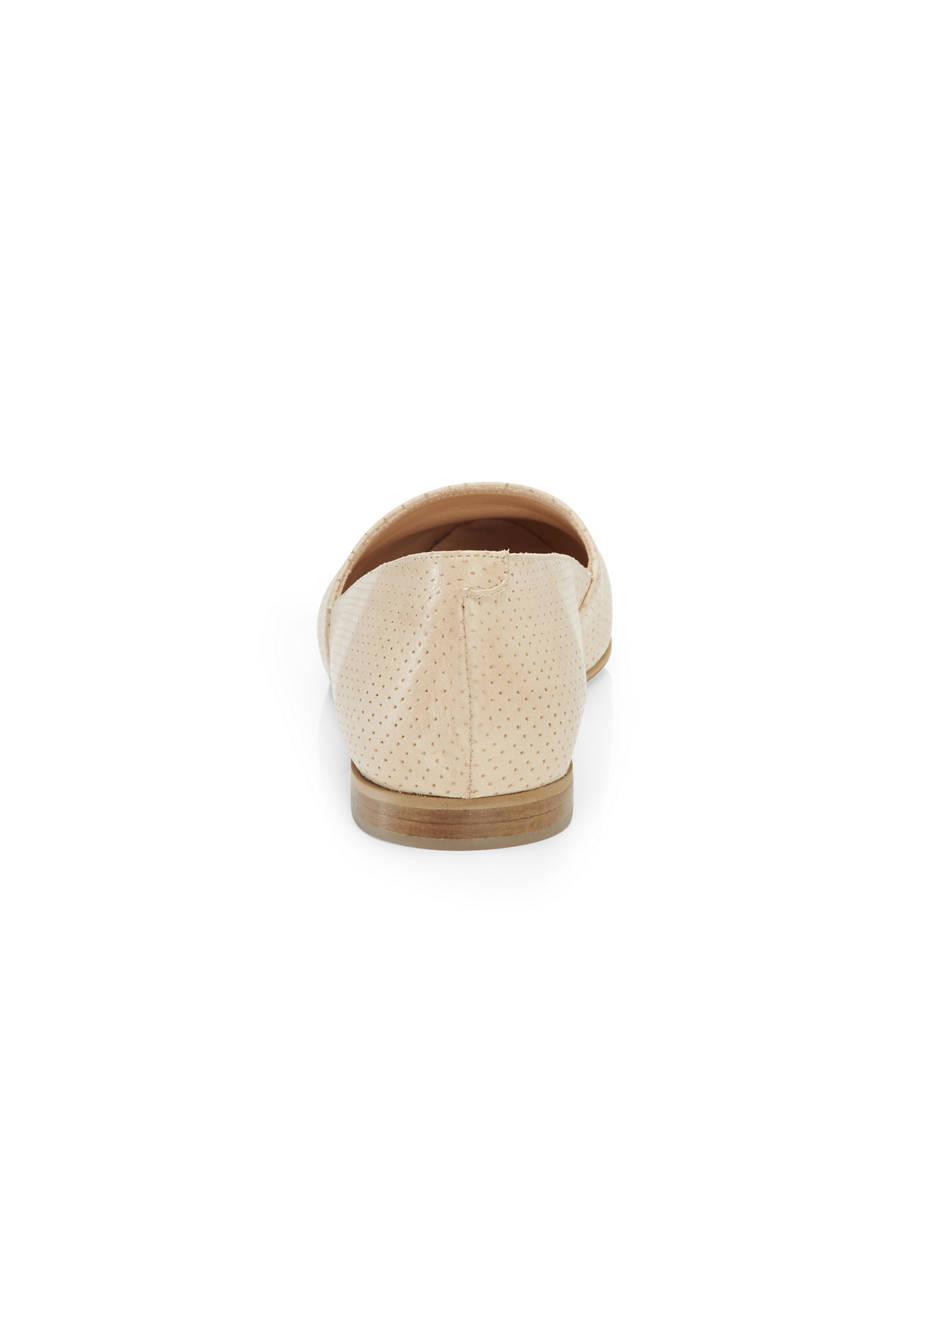 Loafer aus chromfrei gegerbtem Leder